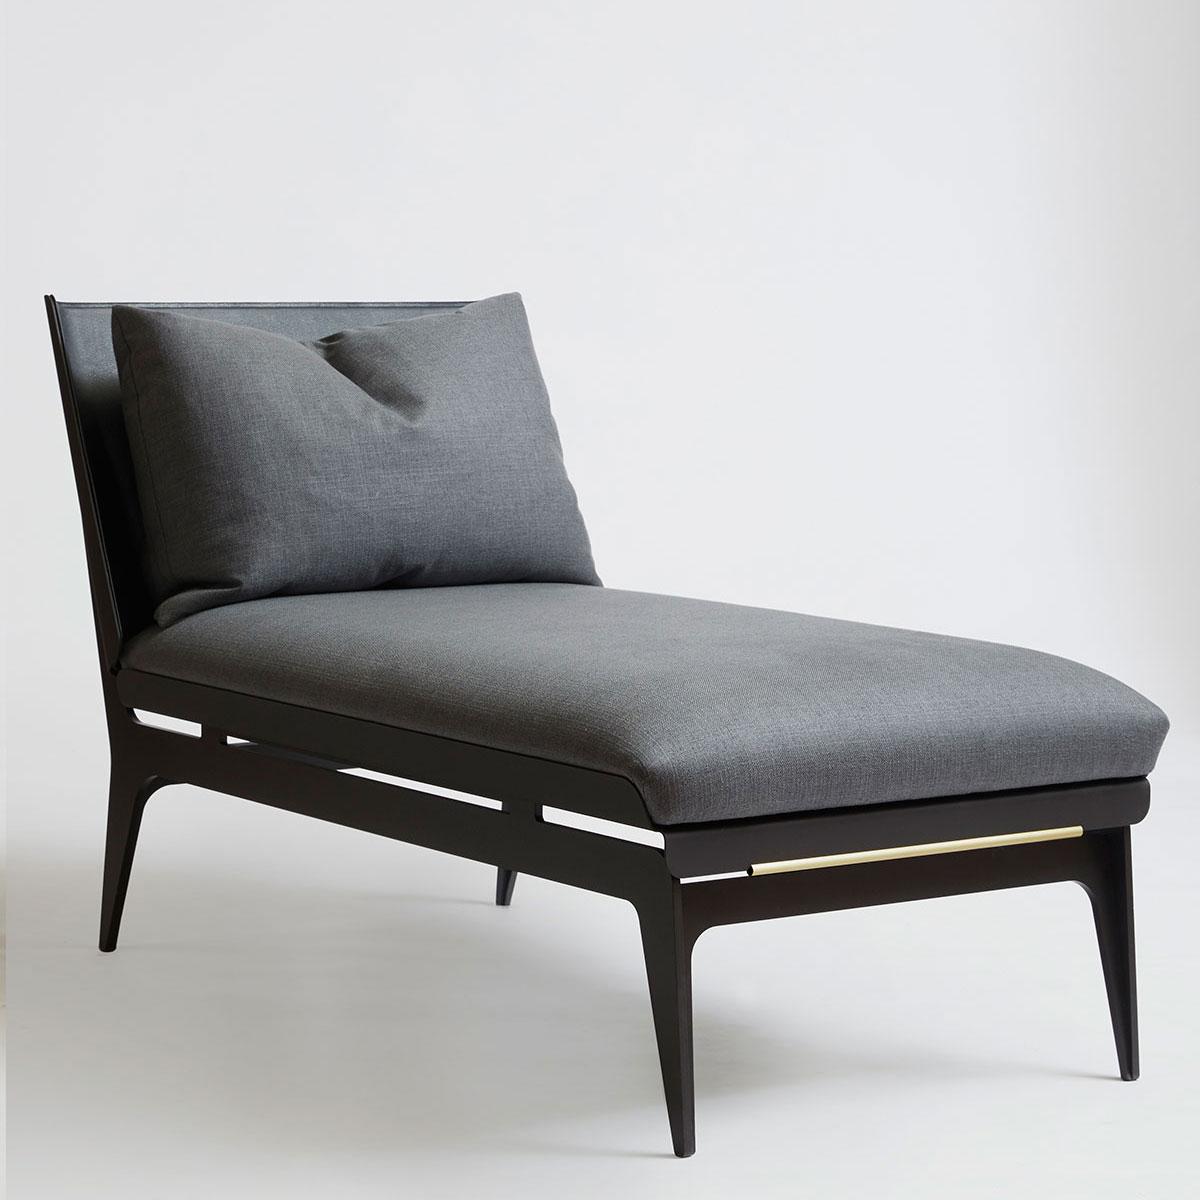 Gabriel scott boudoir chaise longue2 haro